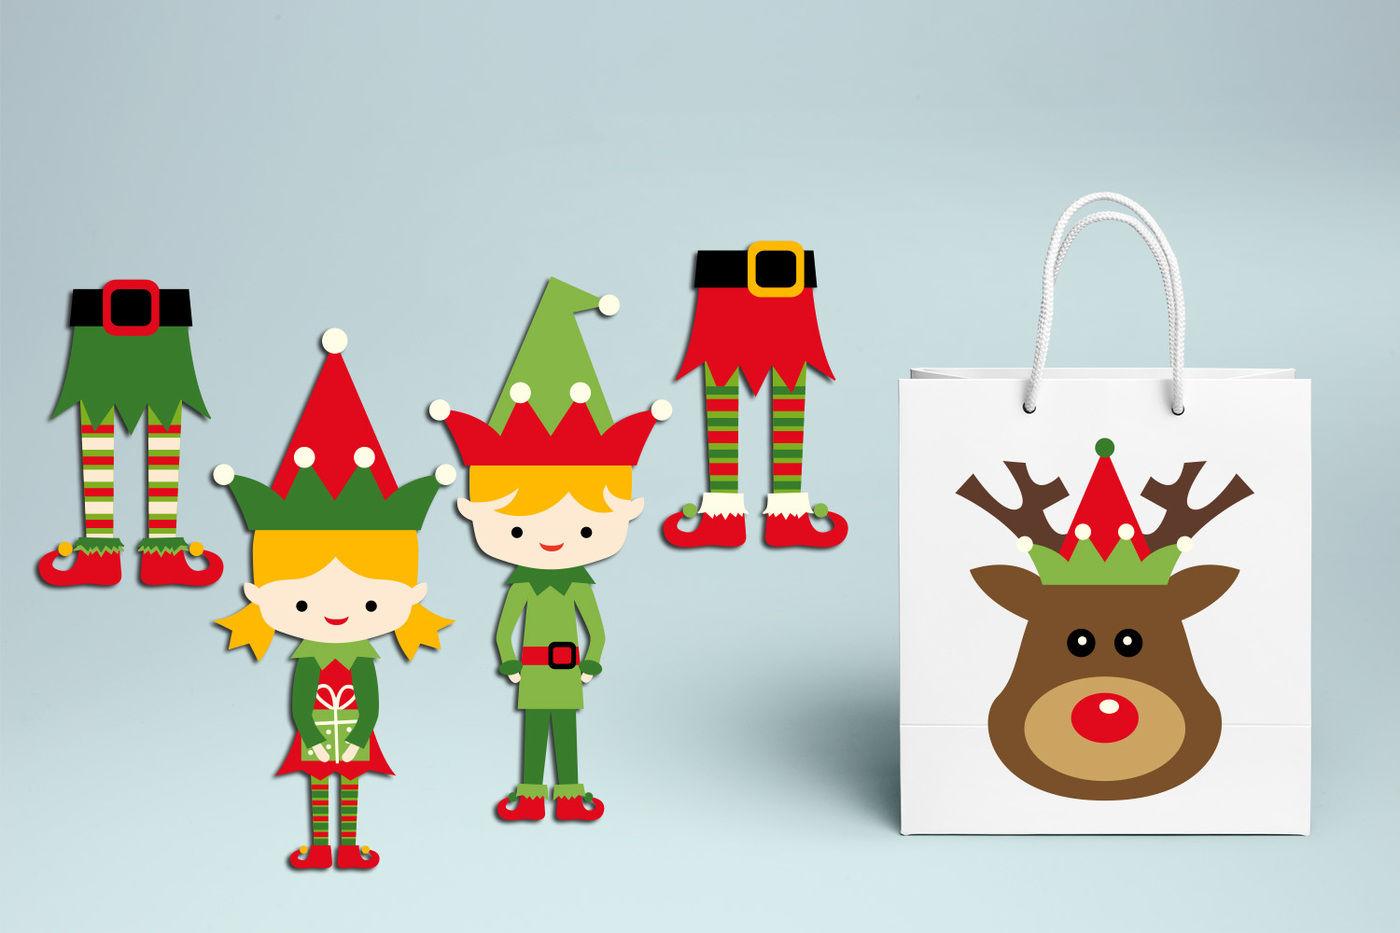 Christmas Elf Graphic Design By Blessedgrafik Thehungryjpeg Com